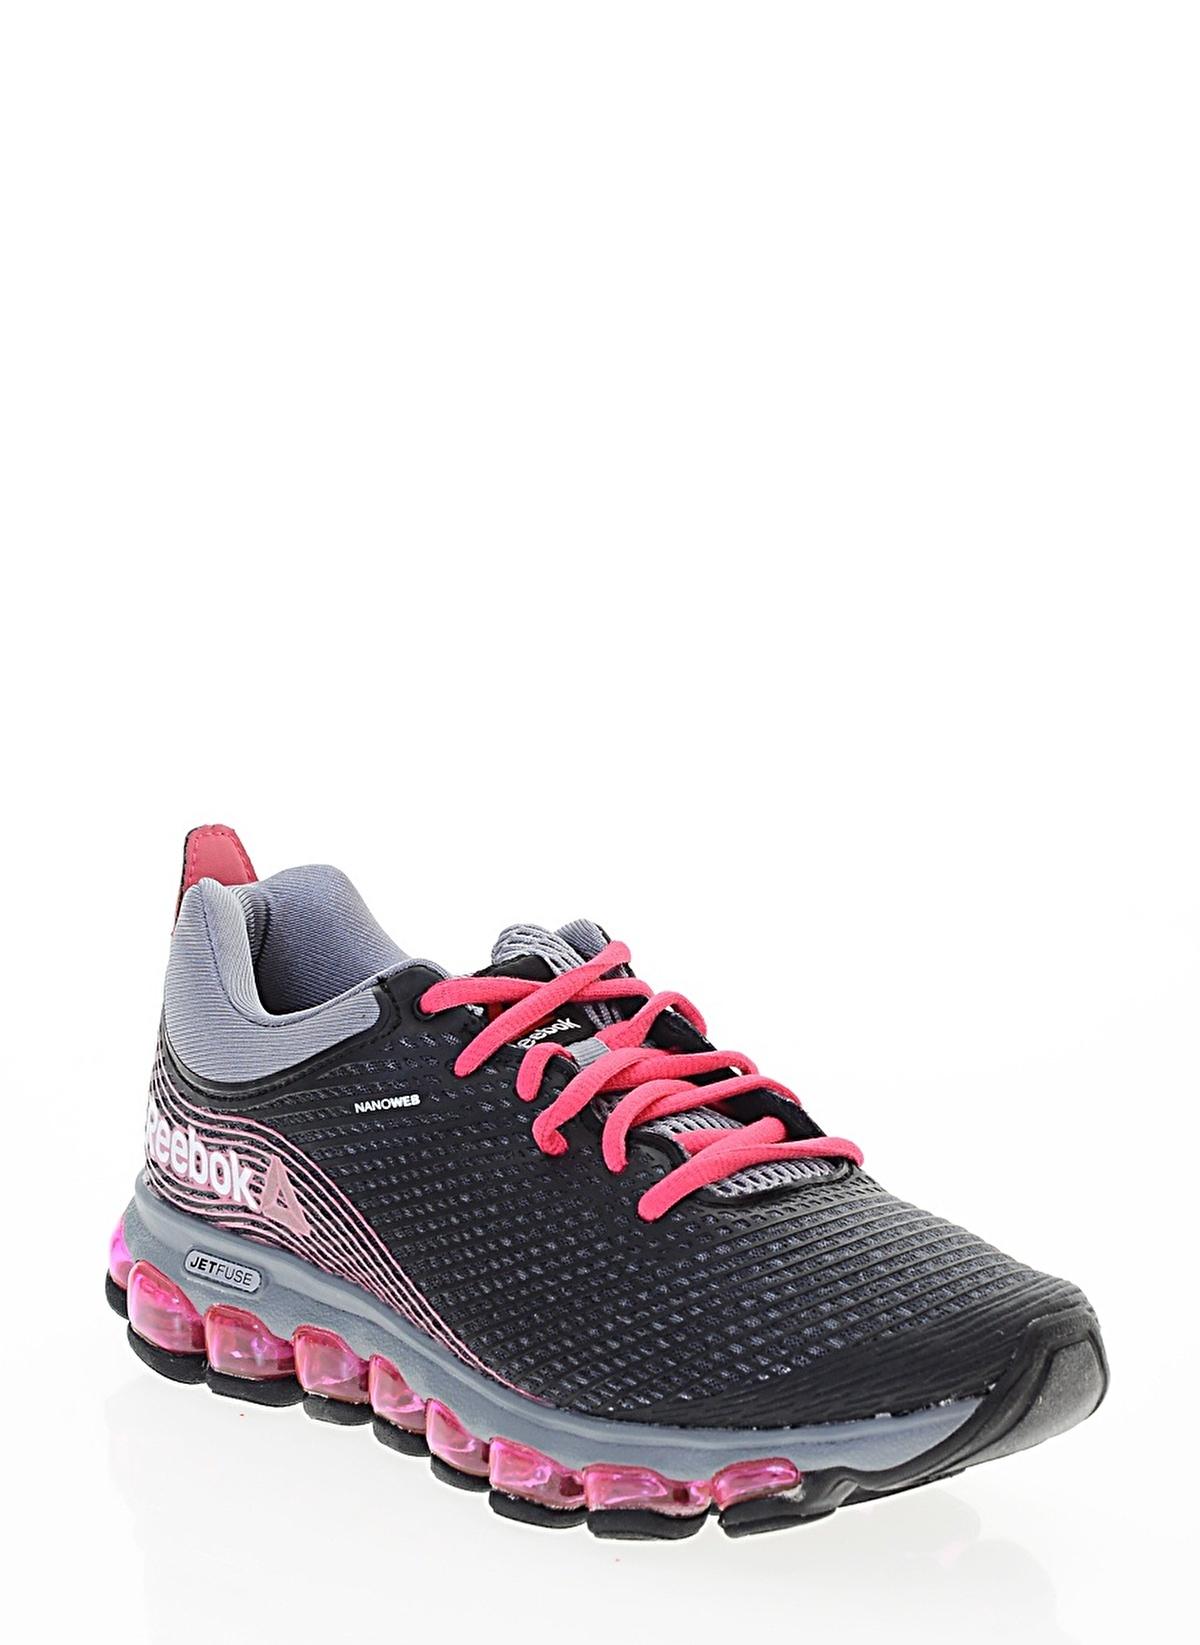 c318ba90d654e4 Reebok Kadın Jetfuse Run Graphite Pink Grey Blk